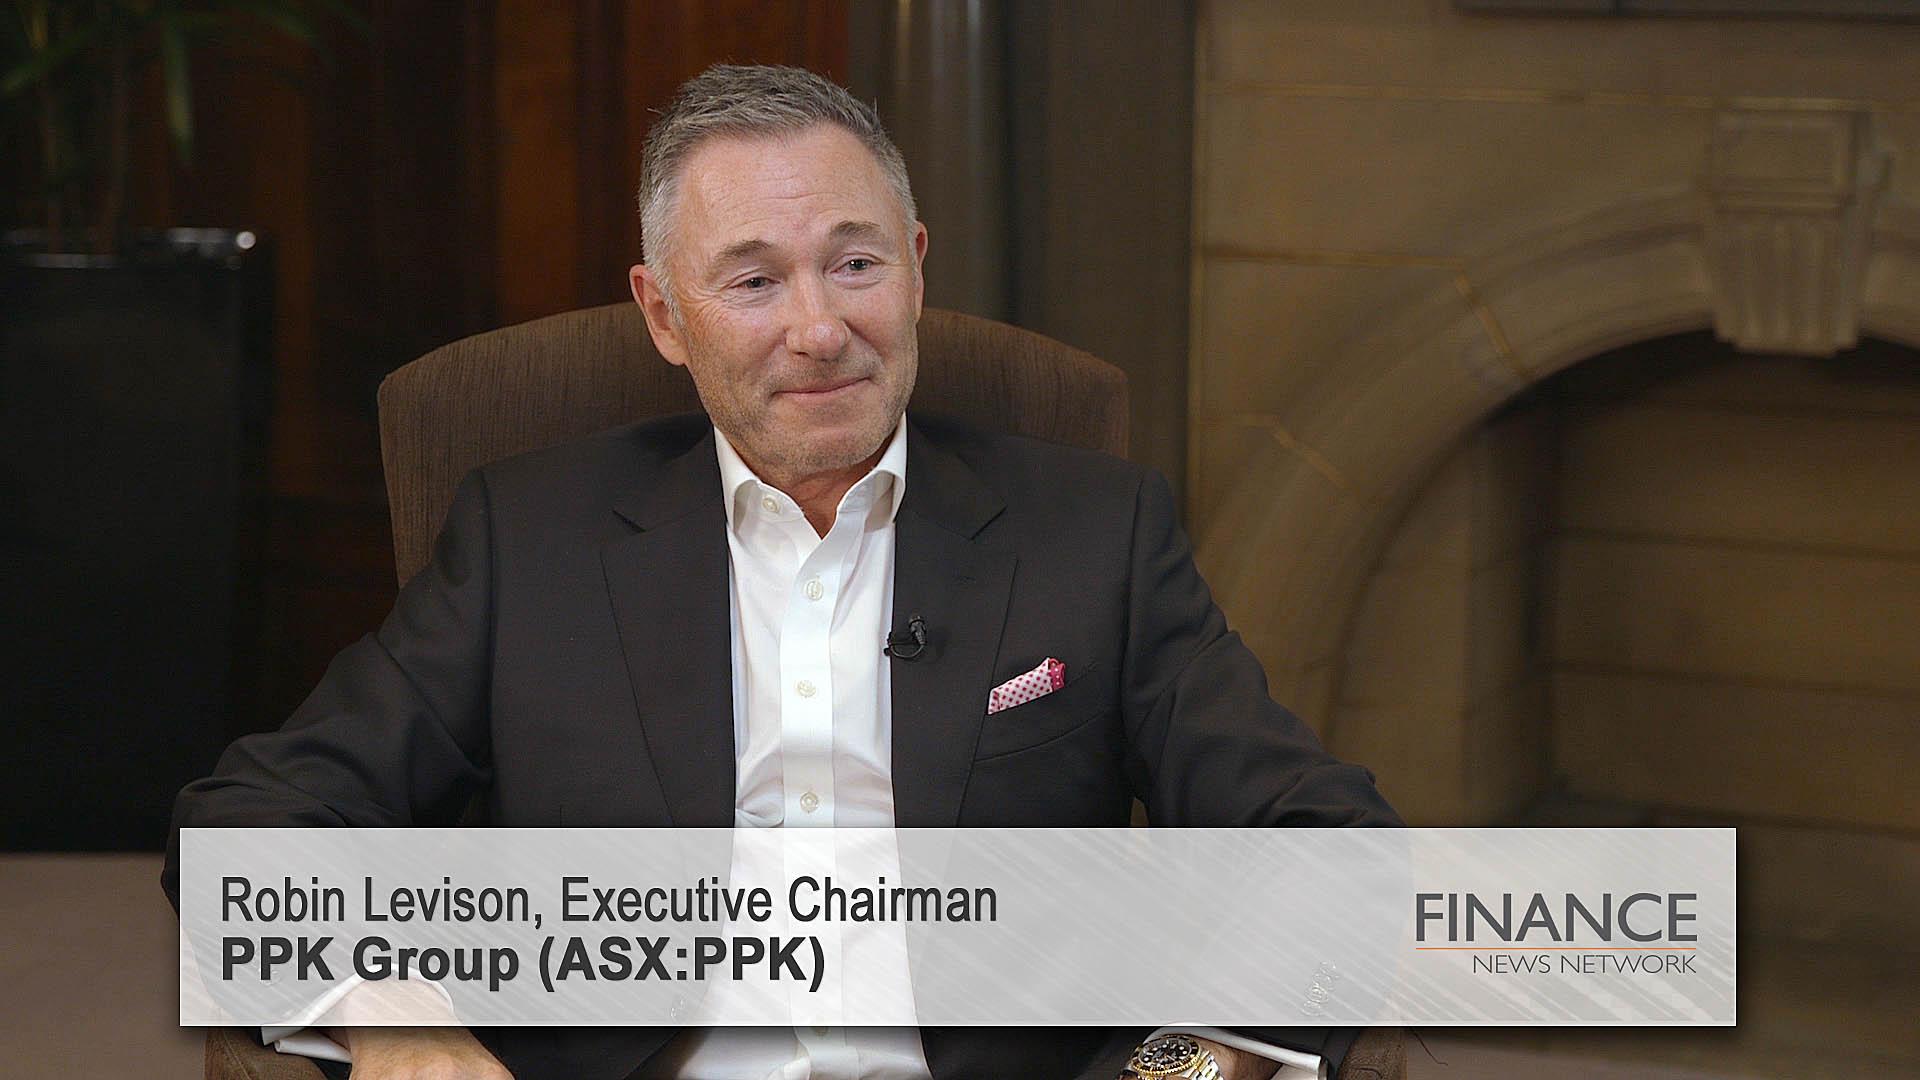 PPK Group (ASX:PPK) FY19 results & outlook